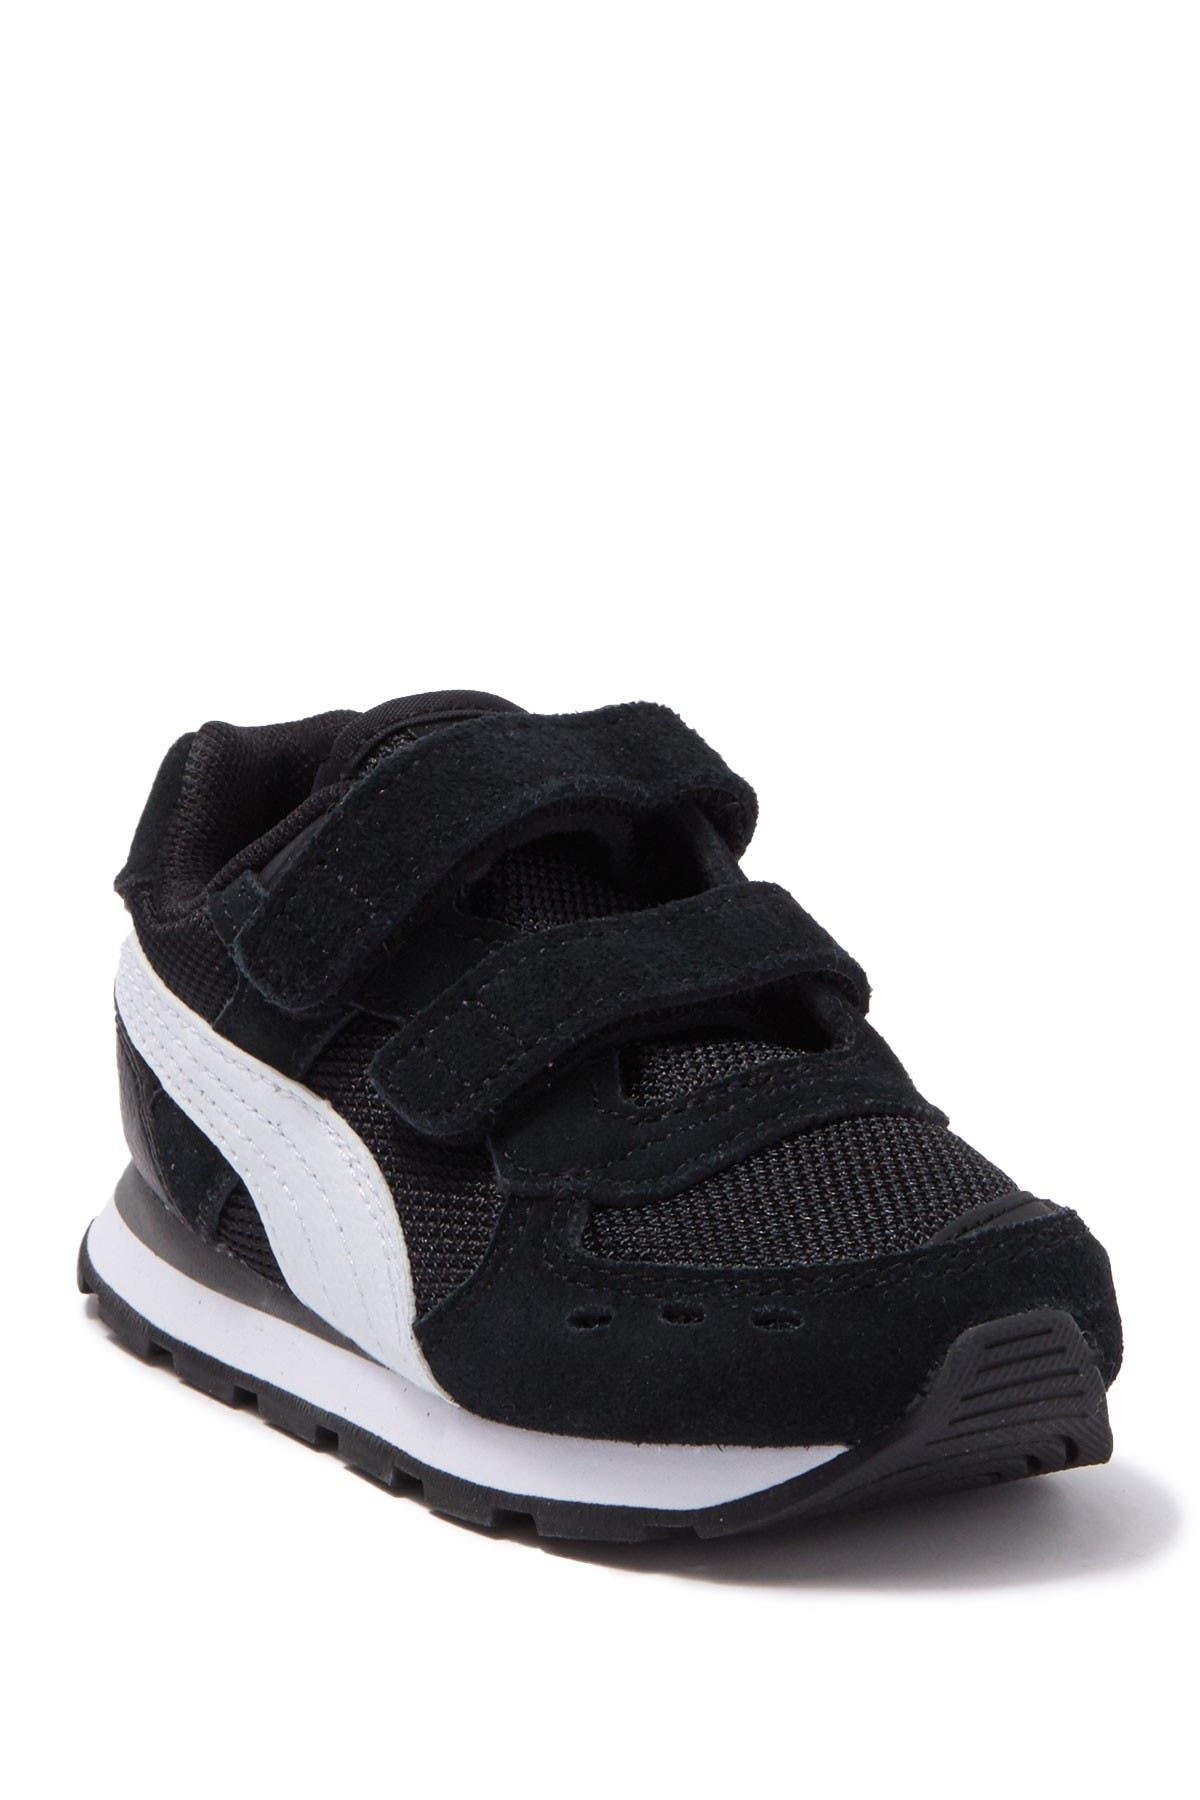 Image of PUMA Vista Sneaker